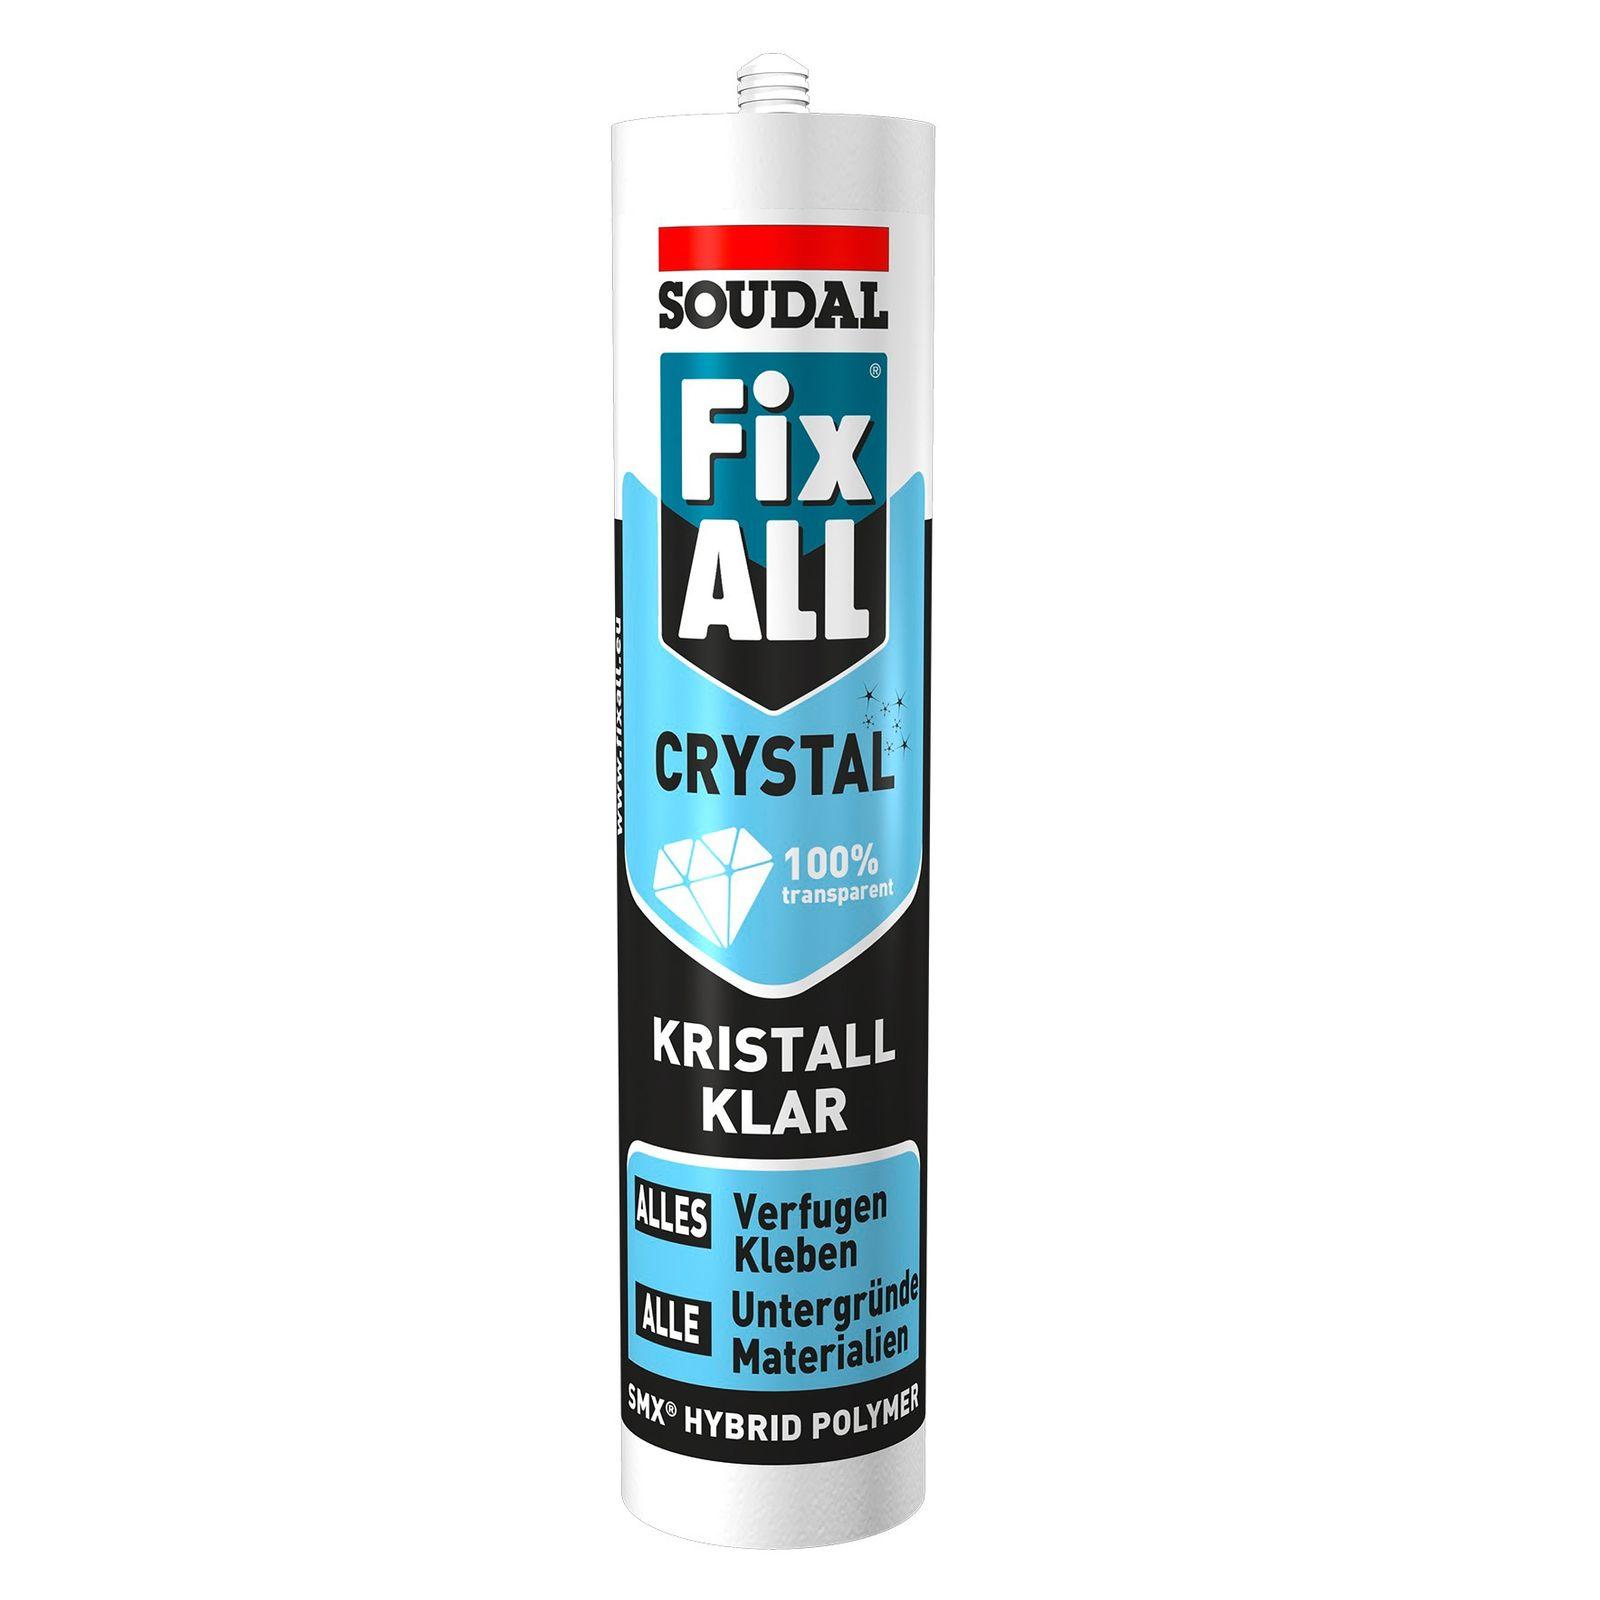 Befestigungstechnik Soudal Fix All Crystal kristallklar 290ml Dichtstoff Kleber Klebstoff Universal 770159